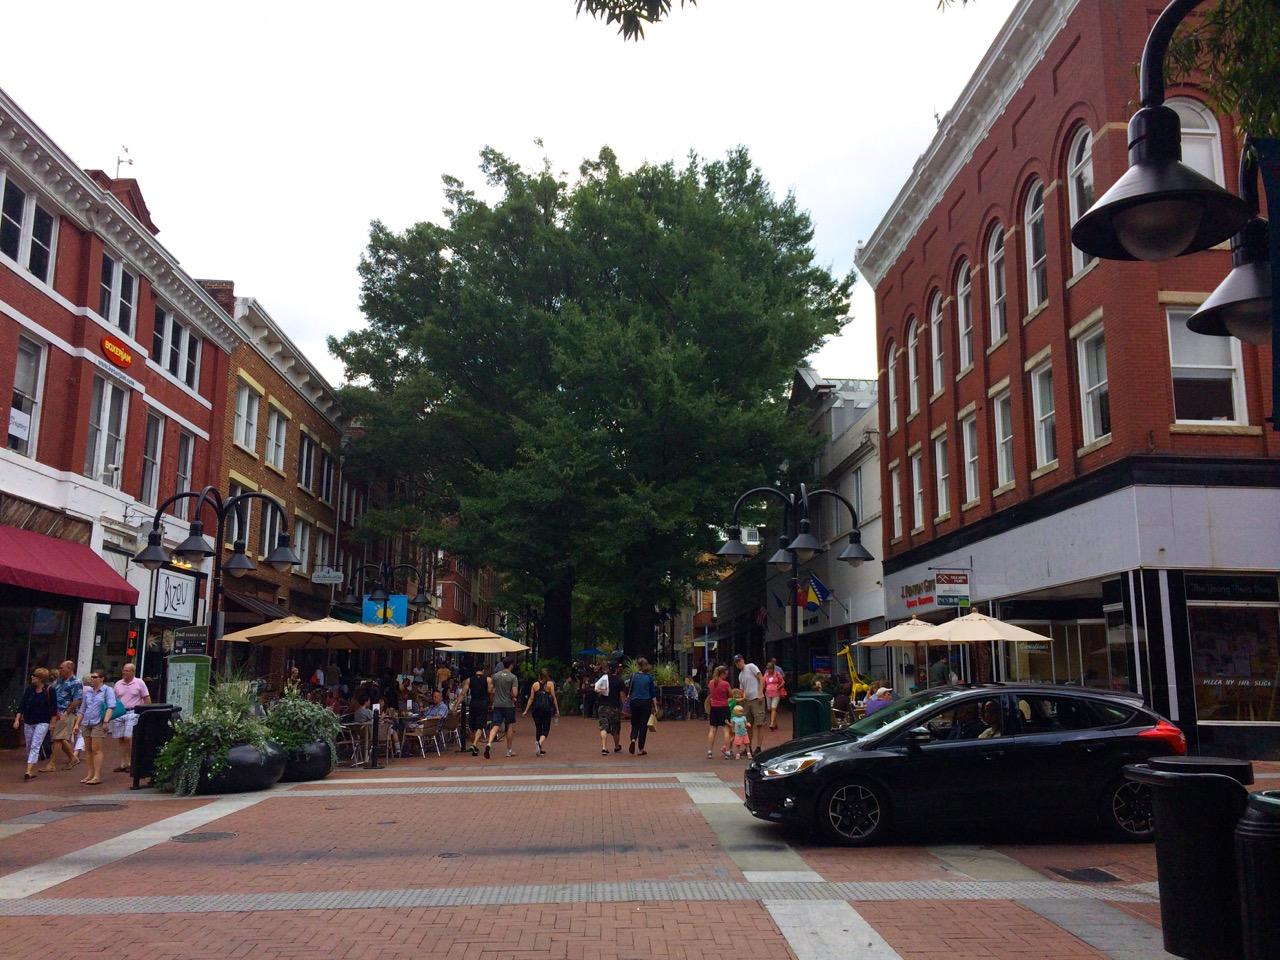 Charlottesville-VA-downtown-IthacaBuilds-08091401